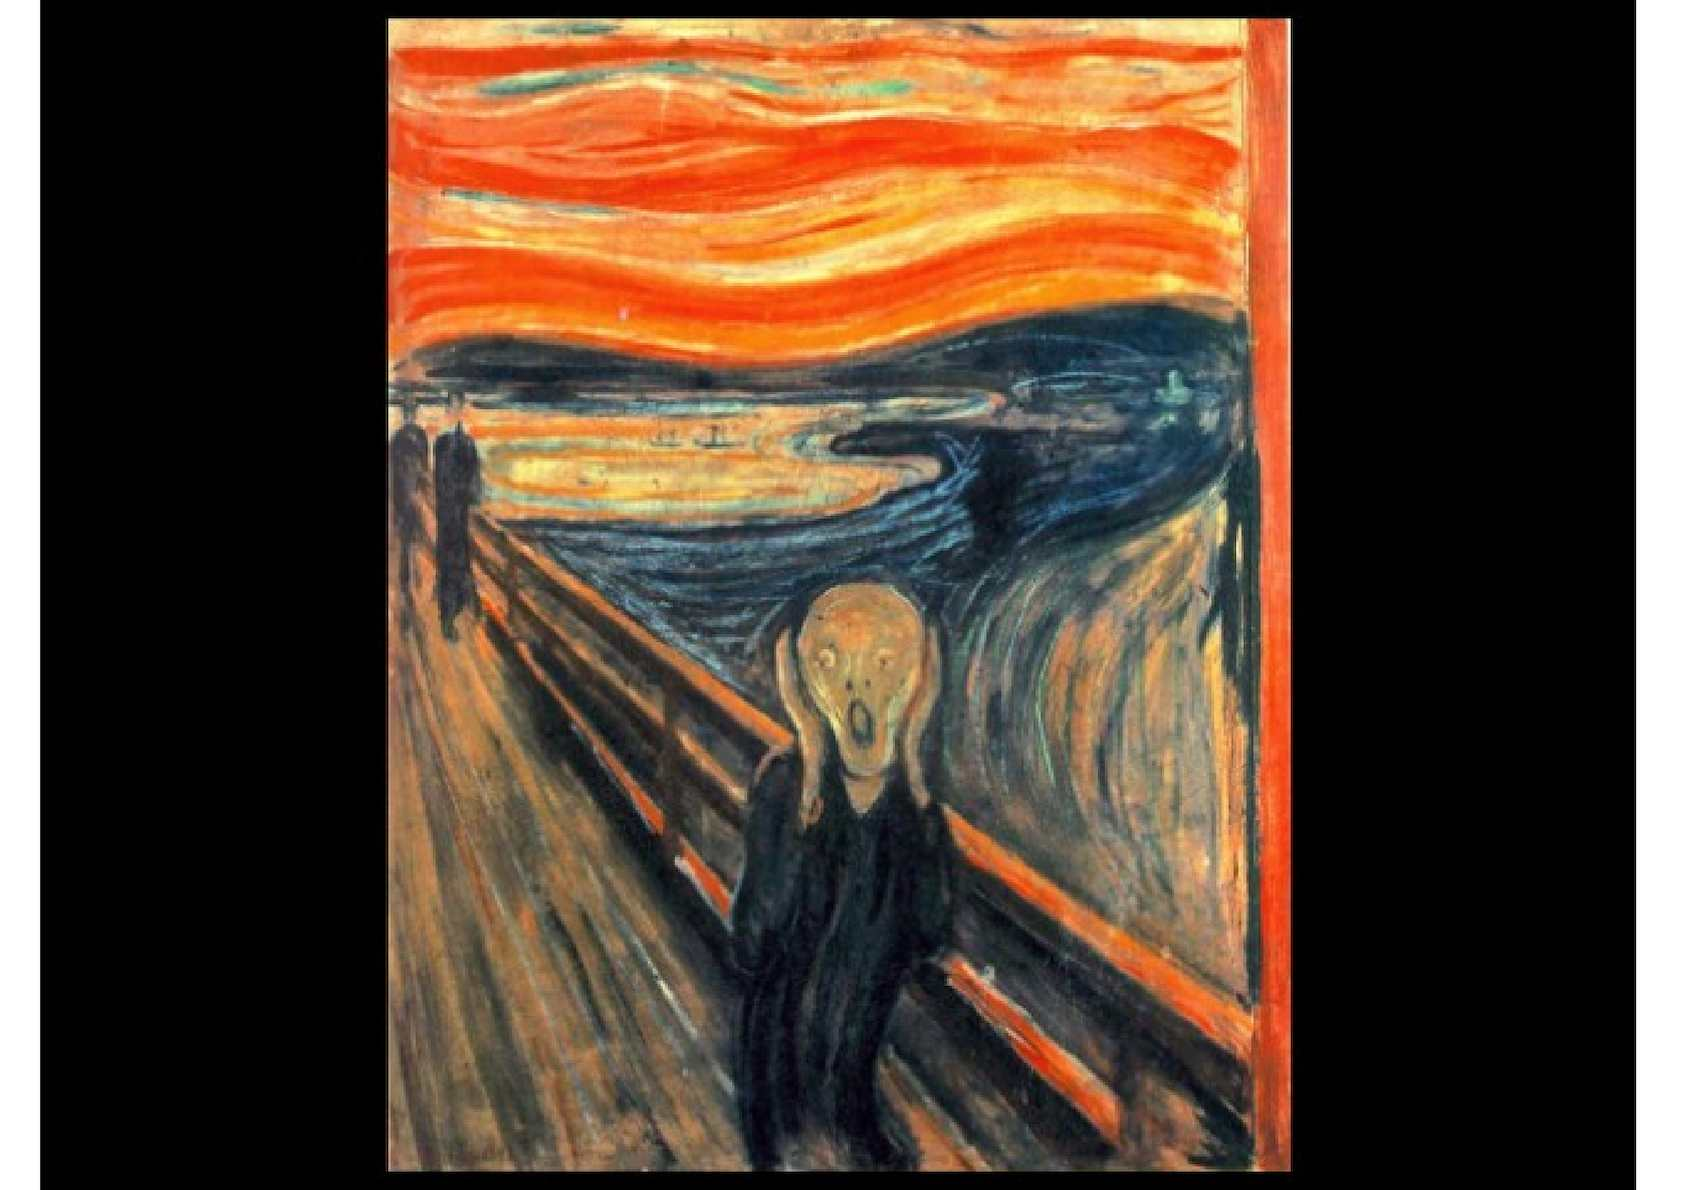 essay on edvard munch the scream